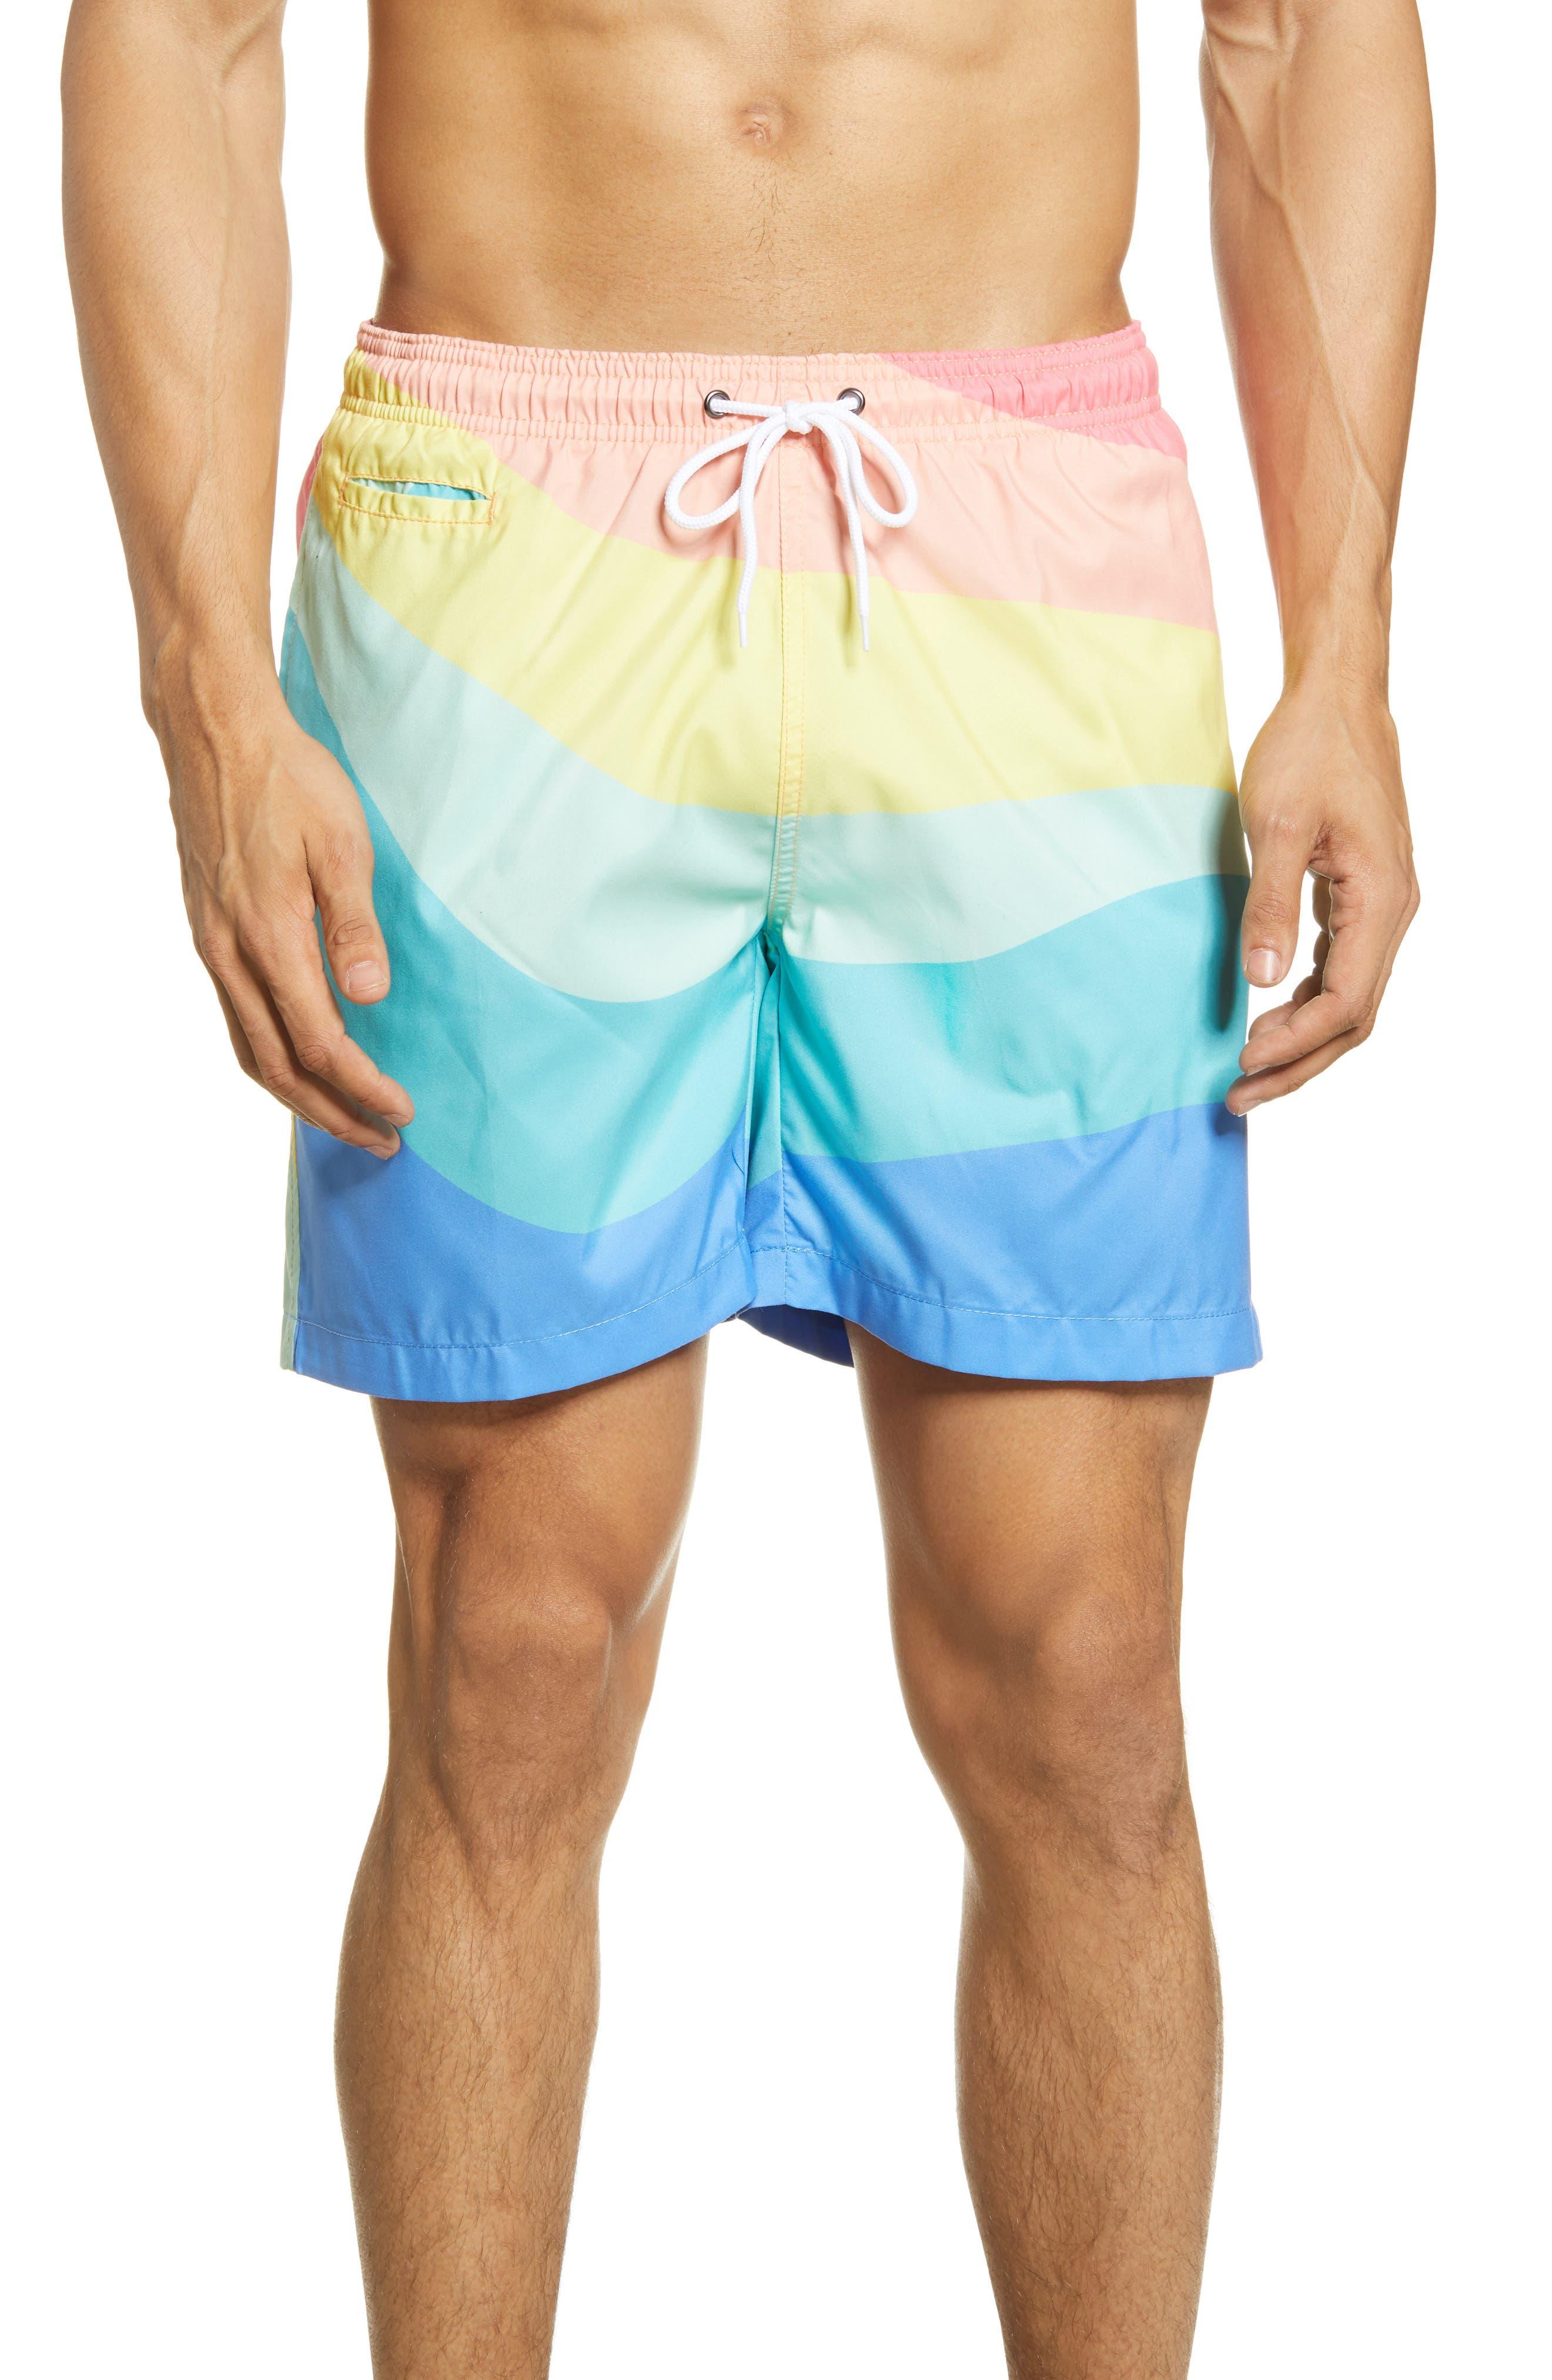 Vintage Men's Swimsuits – 1930s, 1940s, 1950s History Mens Trunks Surf  Swim Co. Sano Swim Trunks Size X-Large - Coral $50.00 AT vintagedancer.com